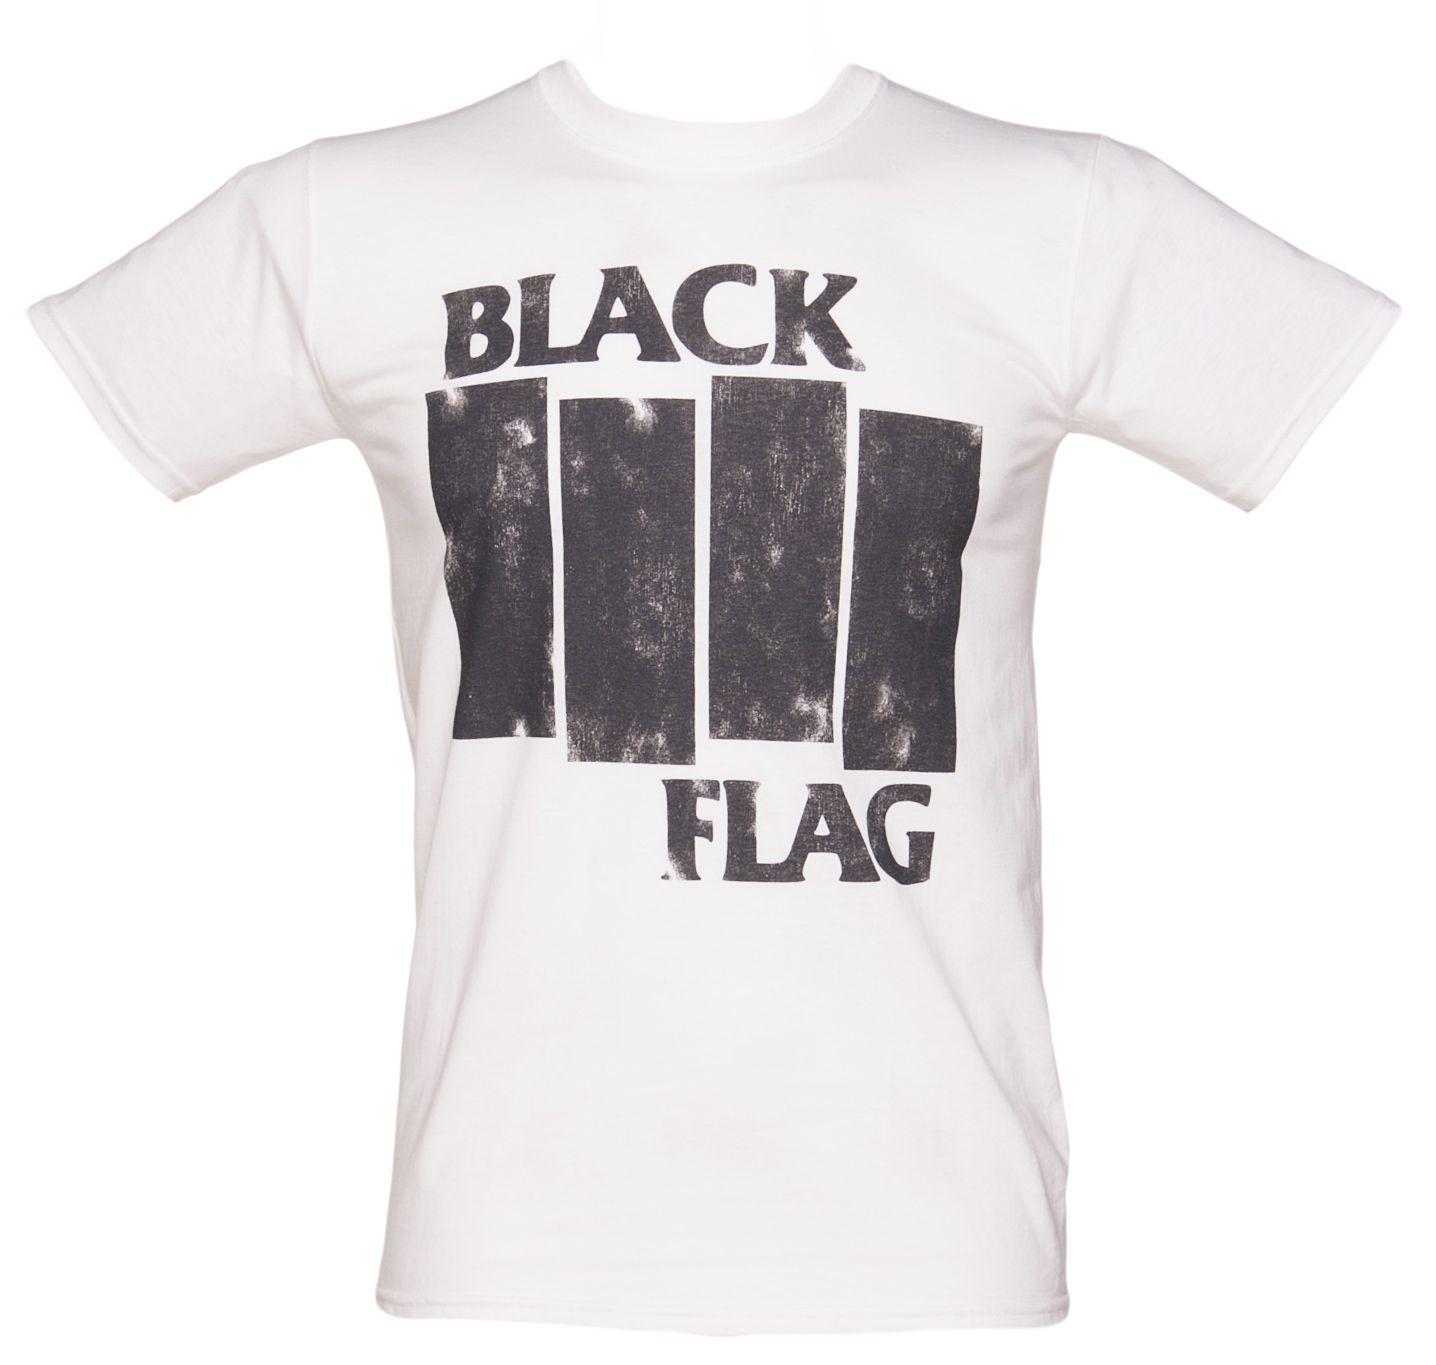 Black flag t shirt uk - Men S Black Flag T Shirt From Truffleshuffle Xoxo